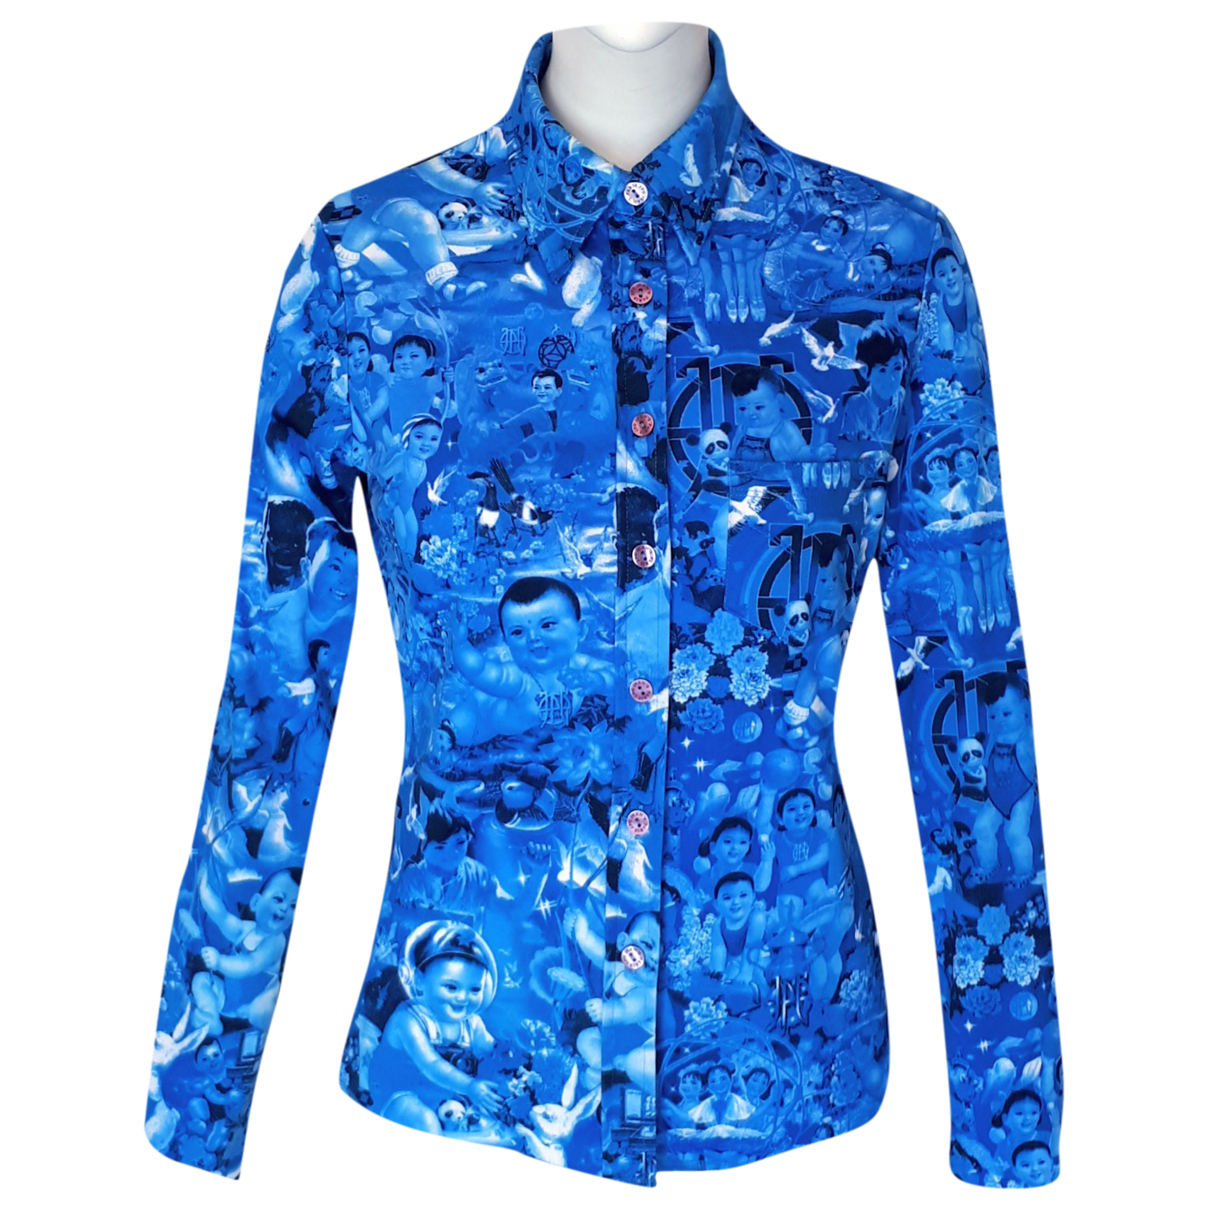 Jean Paul Gaultier \N Top in  Blau Synthetik